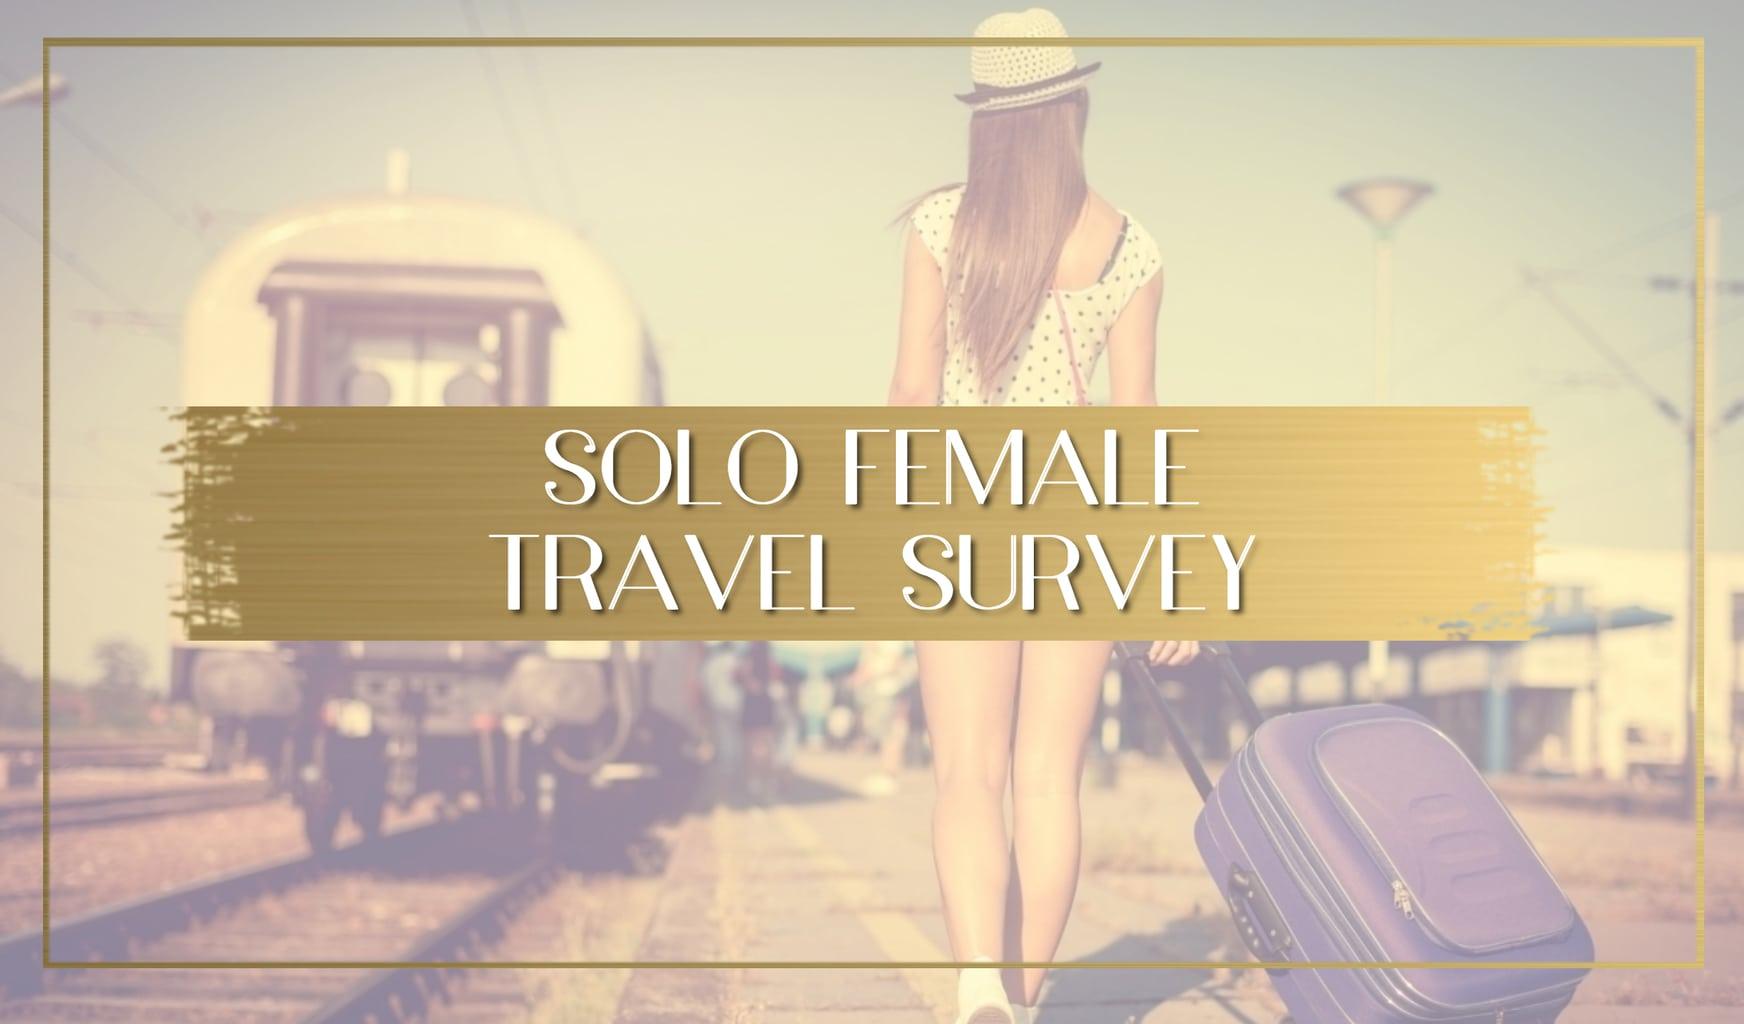 Solo Female Travel Survey 2020 main